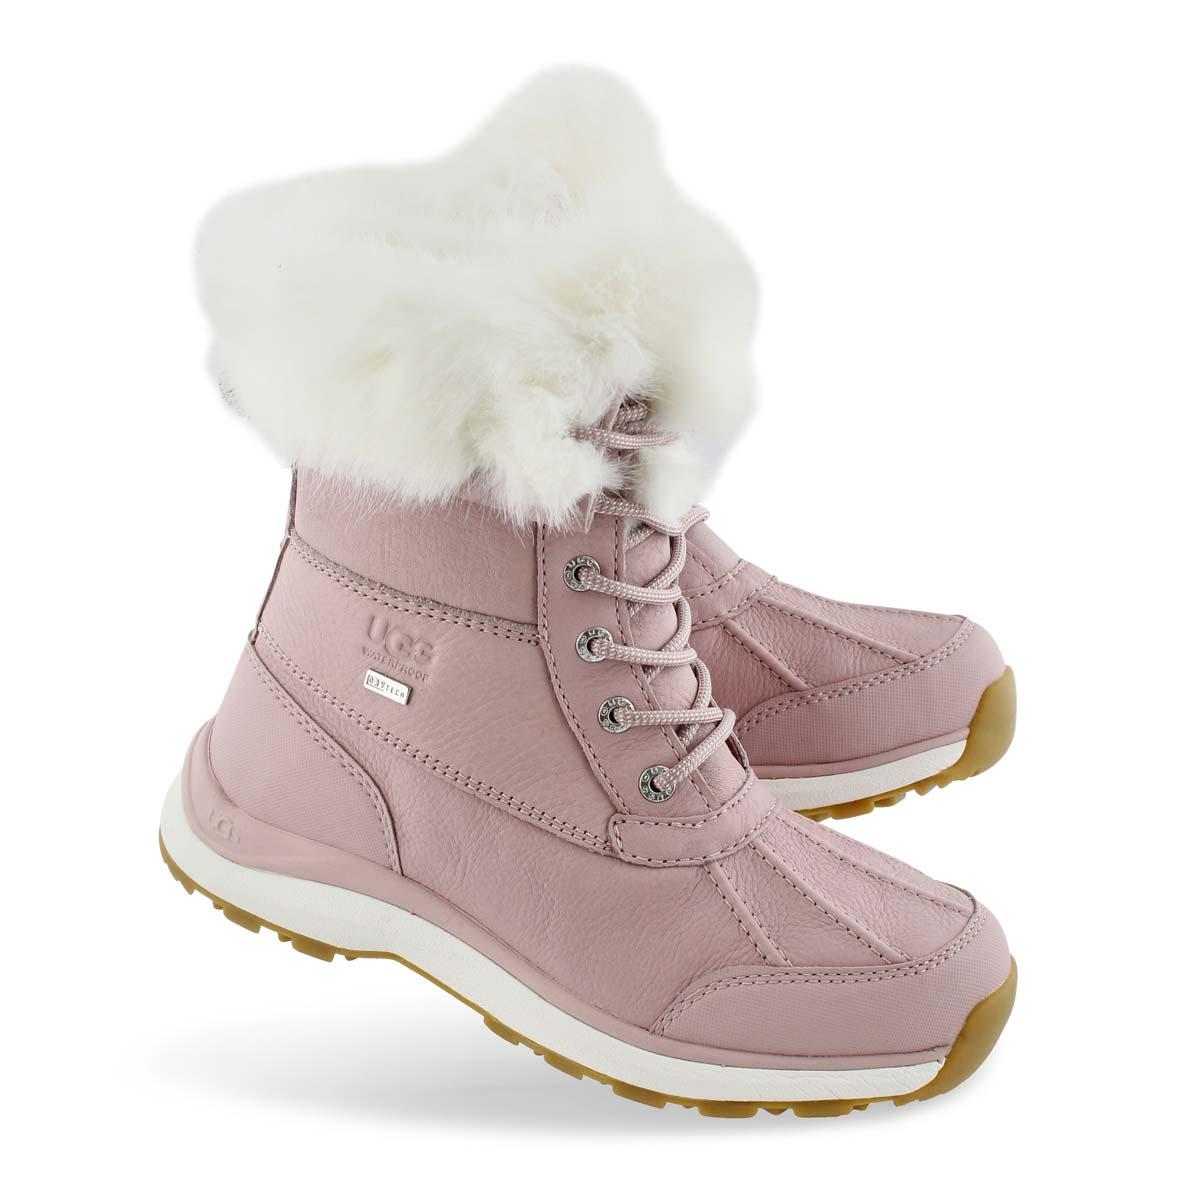 Lds Adirondack III Fluff pnk winter boot